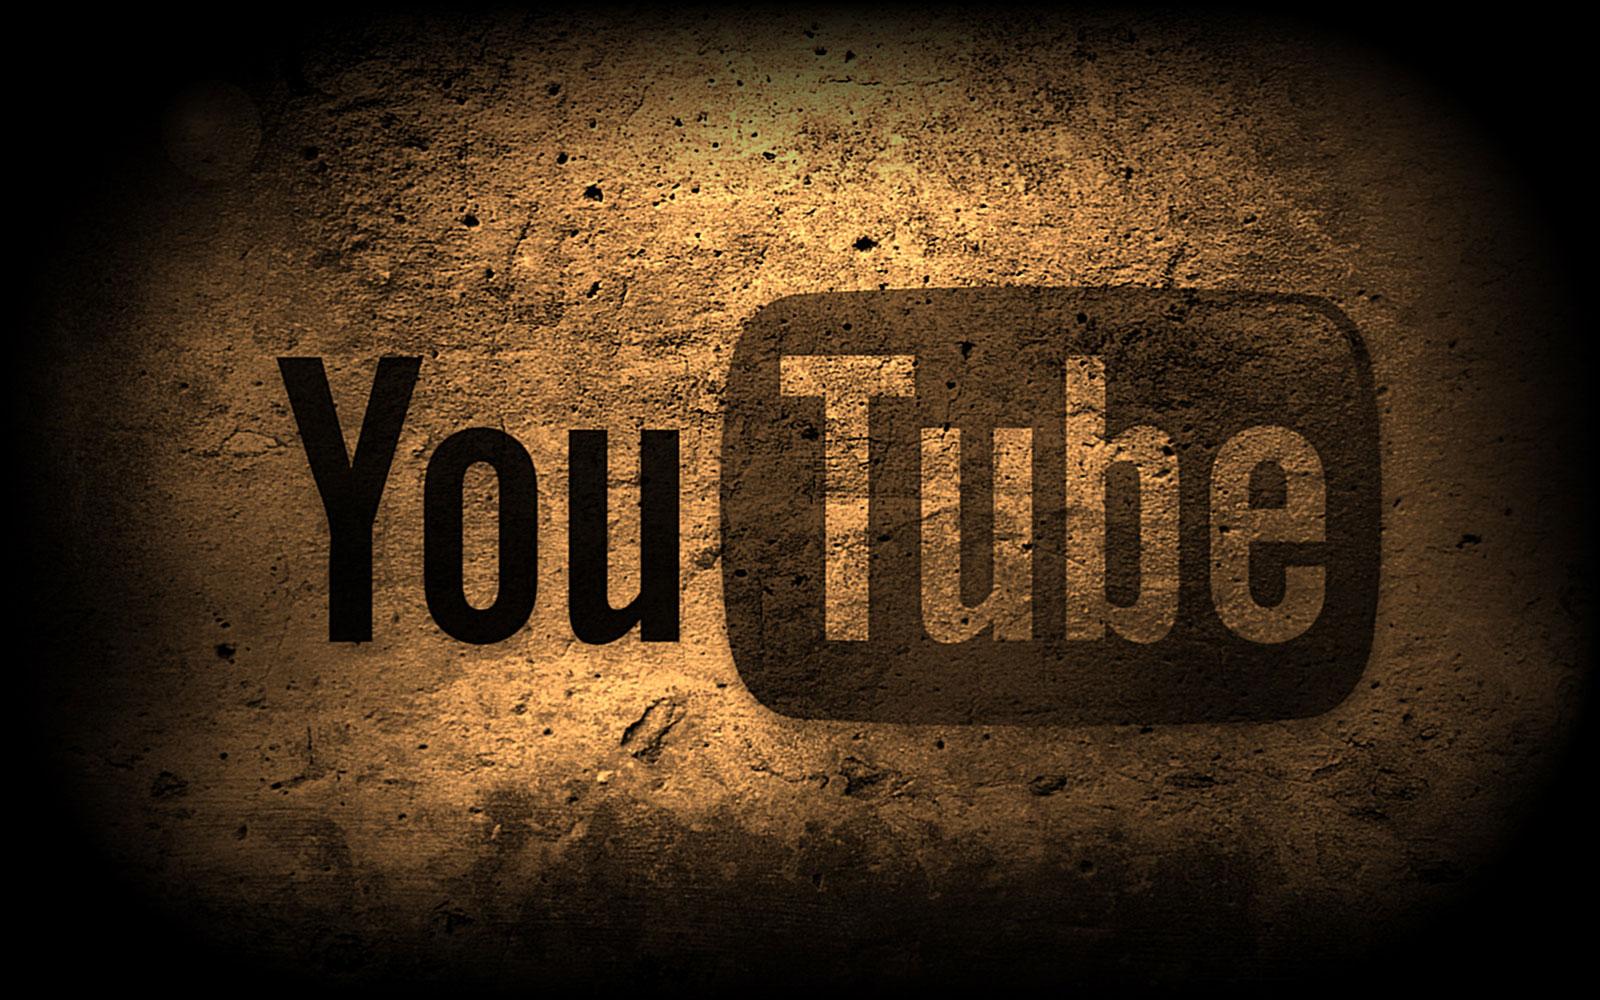 http://4.bp.blogspot.com/-Zuovx5W6xbg/UOWkGThEbdI/AAAAAAAAAE0/Qh4r_qbL2I8/s1600/youtube-wallpaper-dark.jpg